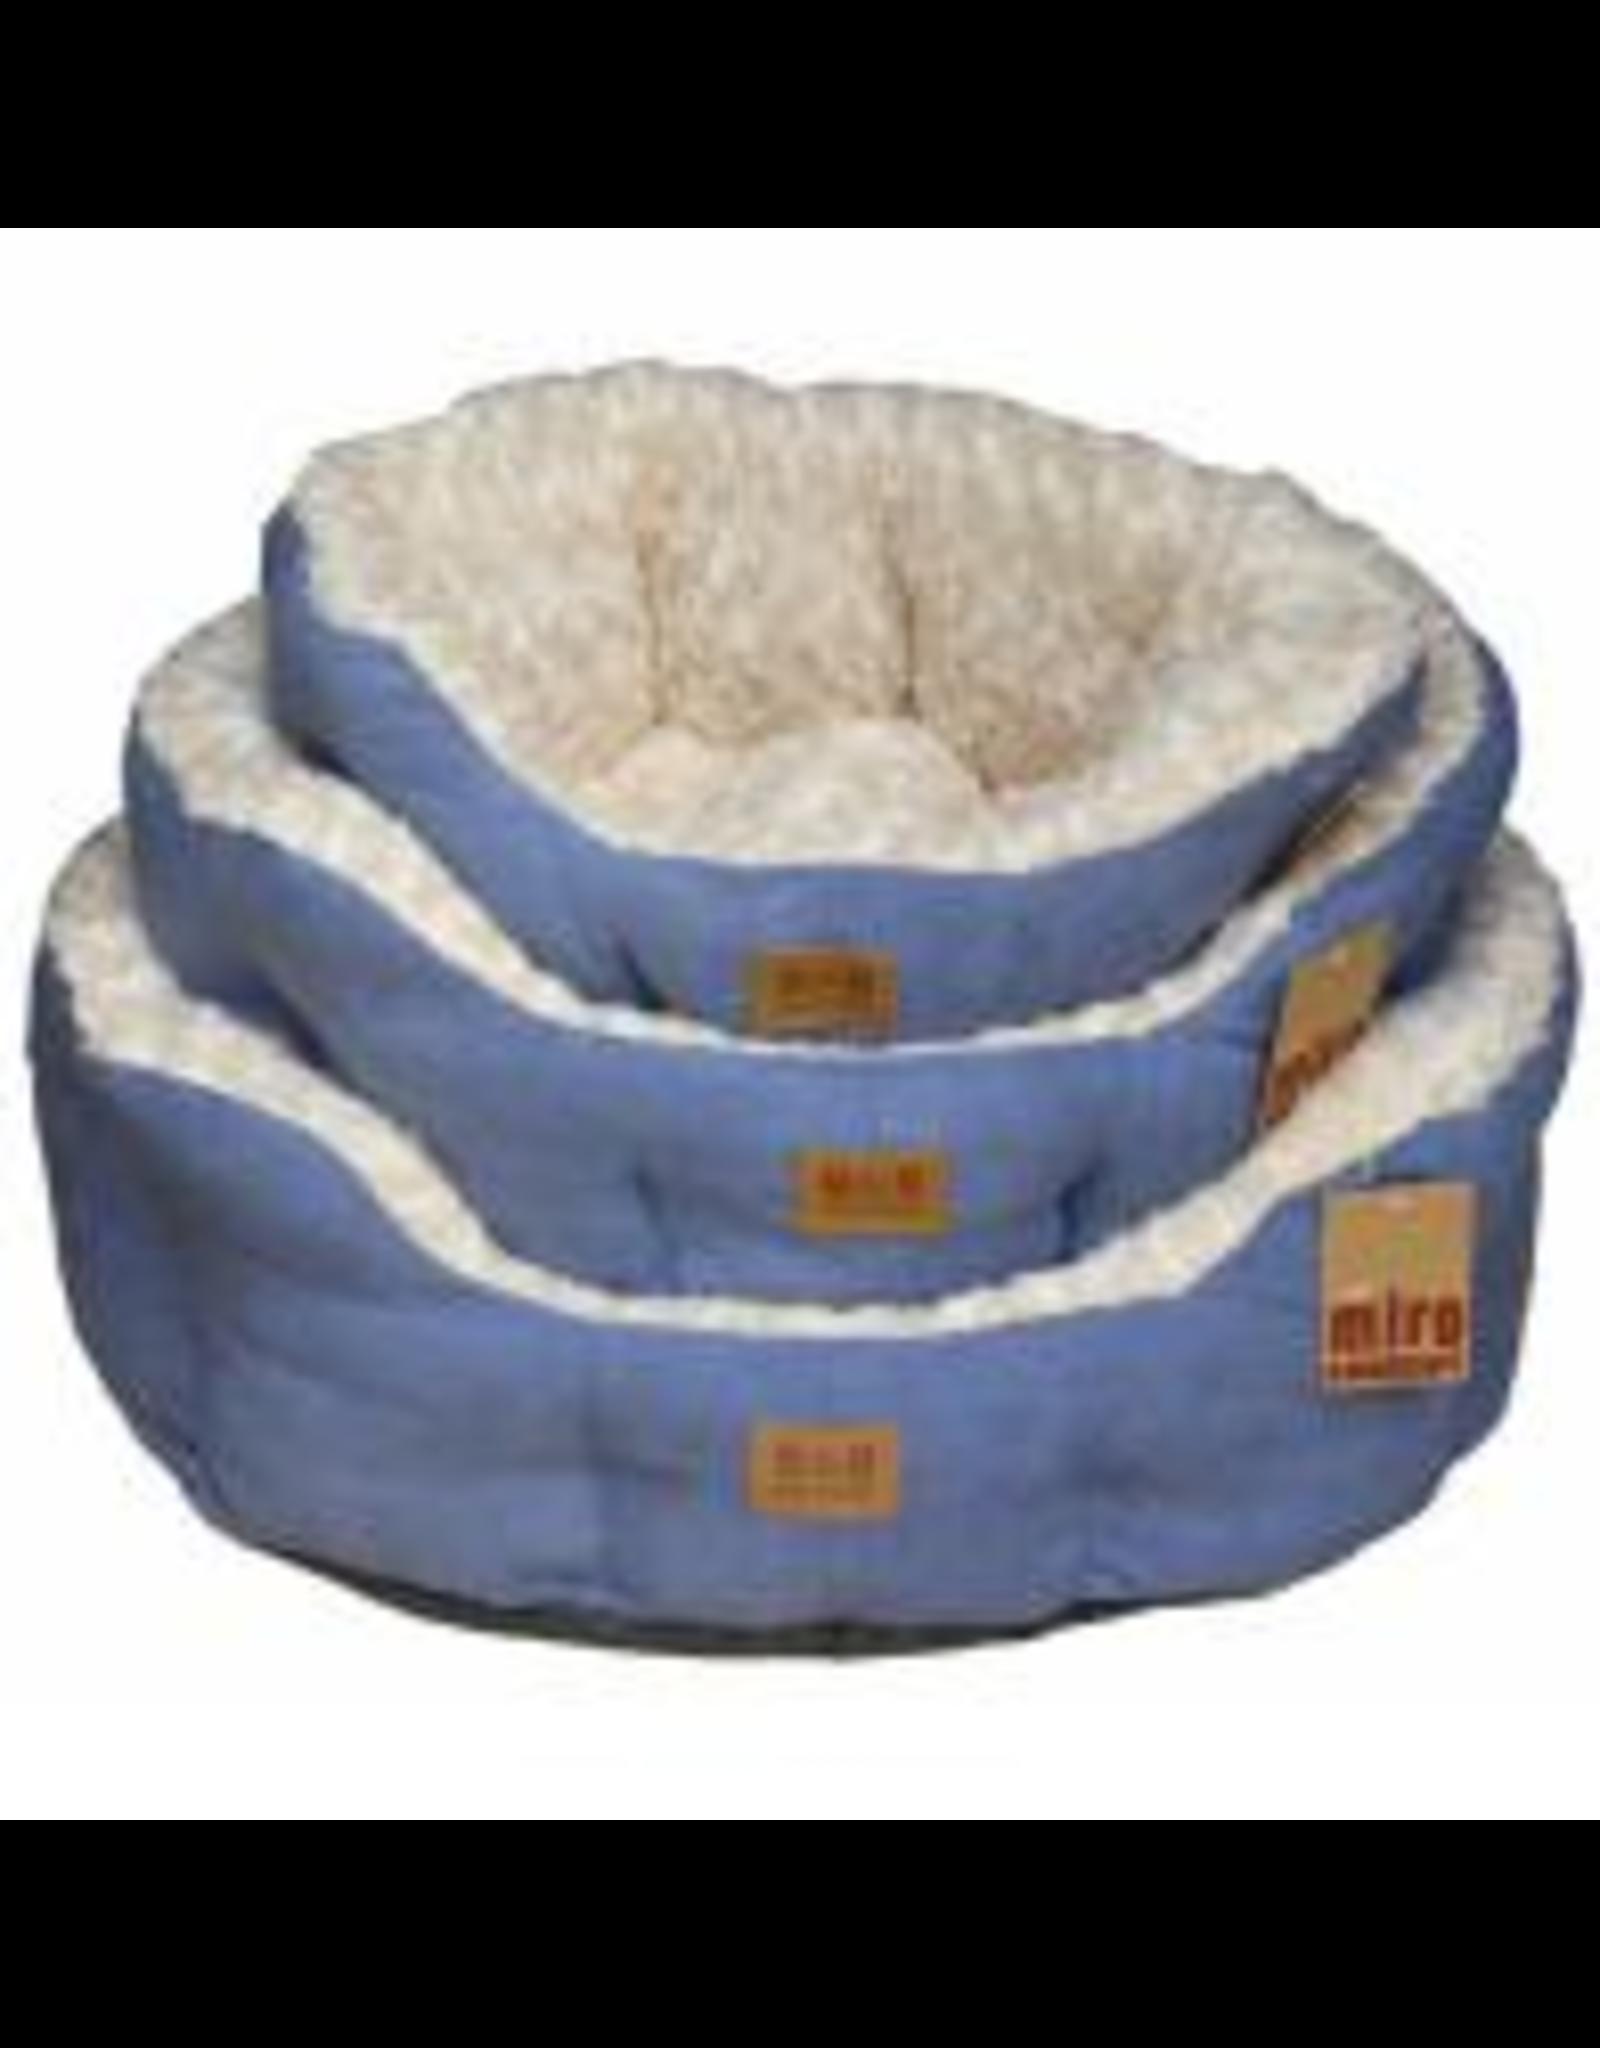 Miro Makauri Makauri Faux Suede Dog Bed Blue & Cream